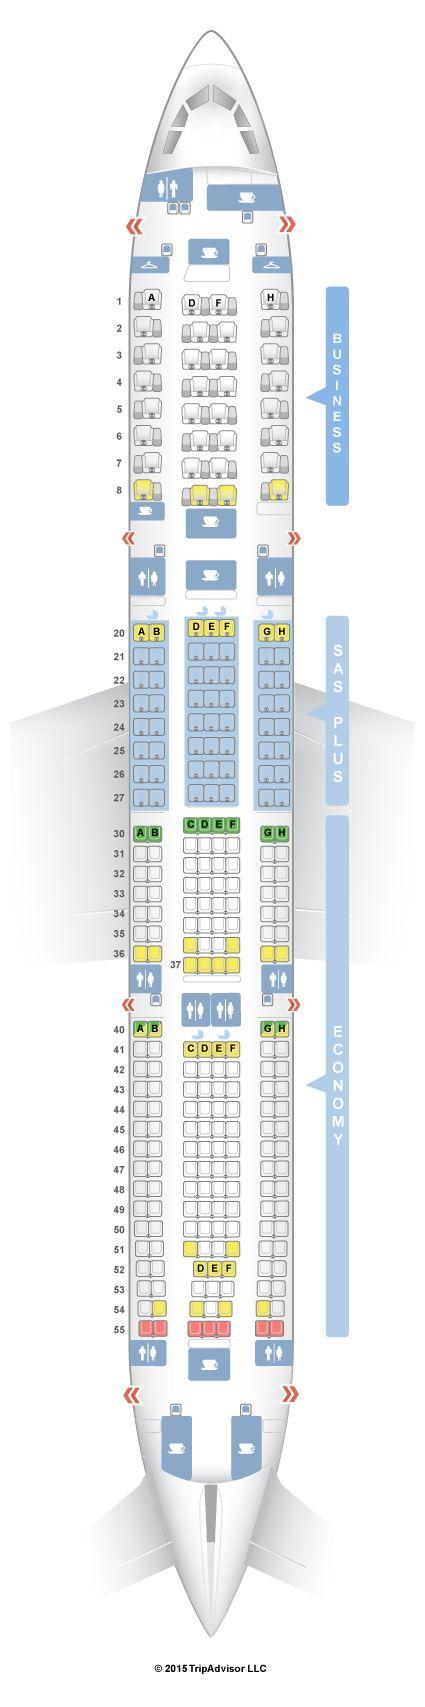 SeatGuru Seat Map SAS Airbus A330-300 (333) V2